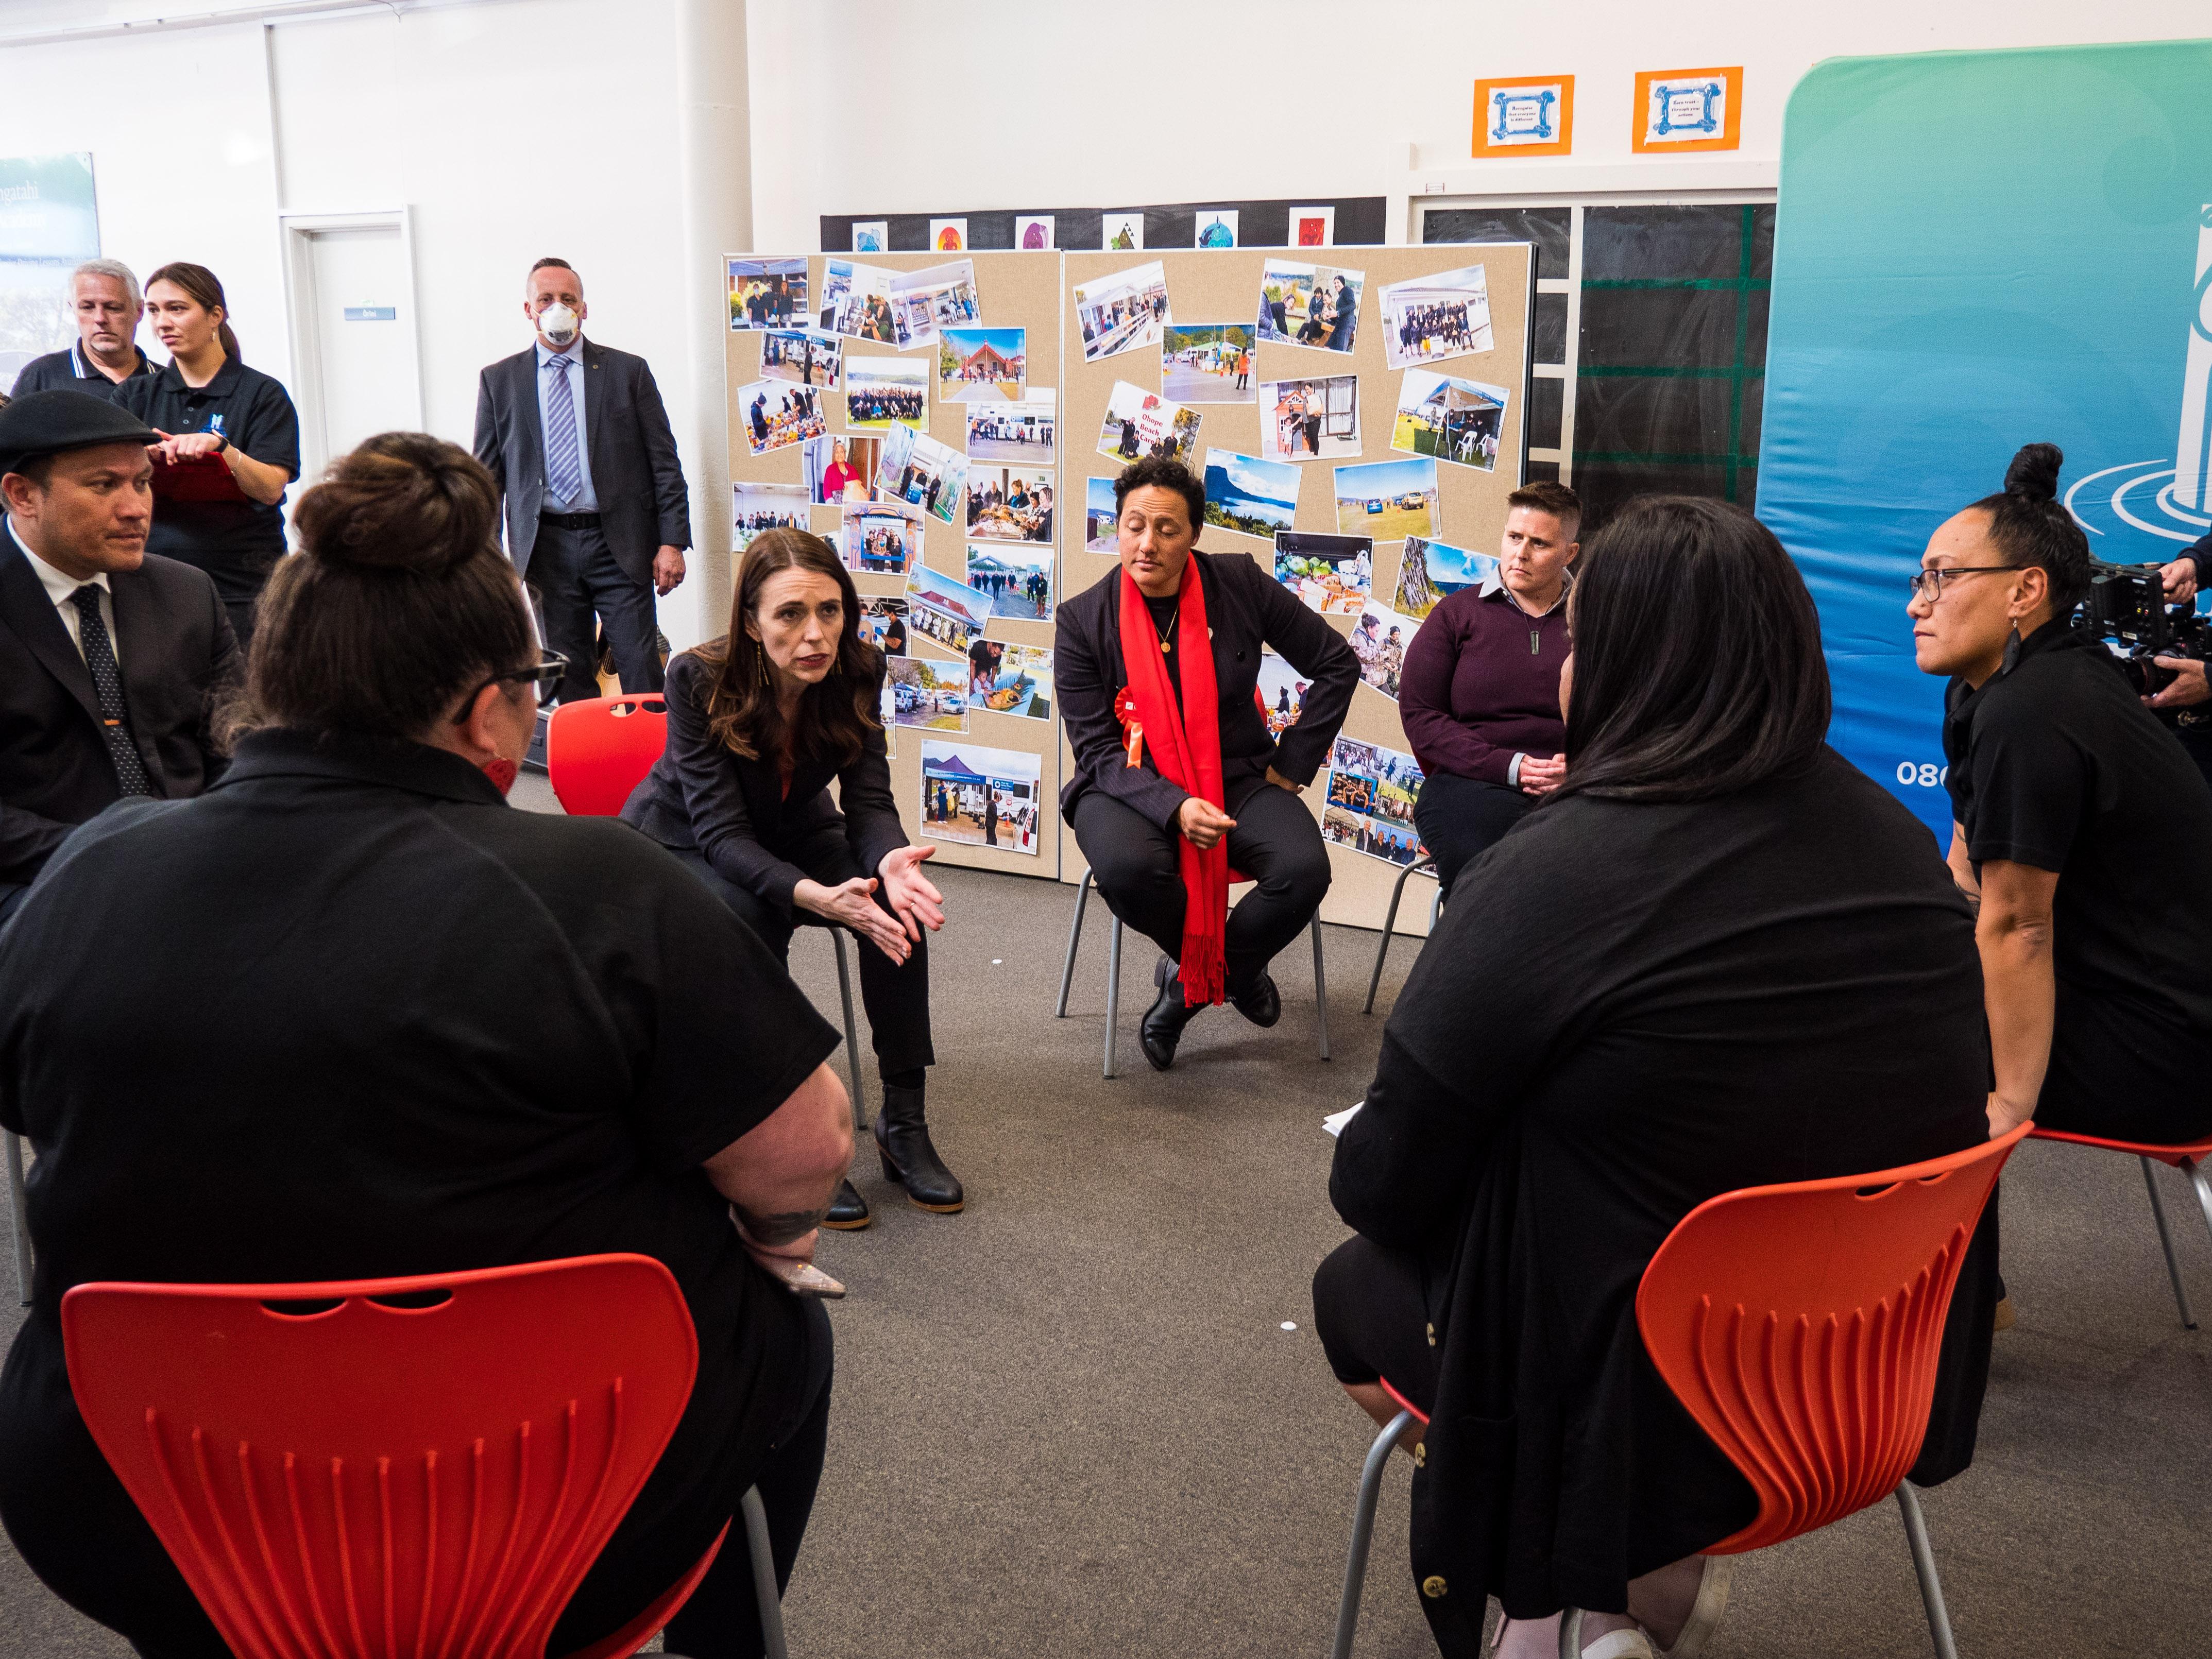 Prime Minister Jacinda Ardern converses with Te Puna Ora o Mataatua staff